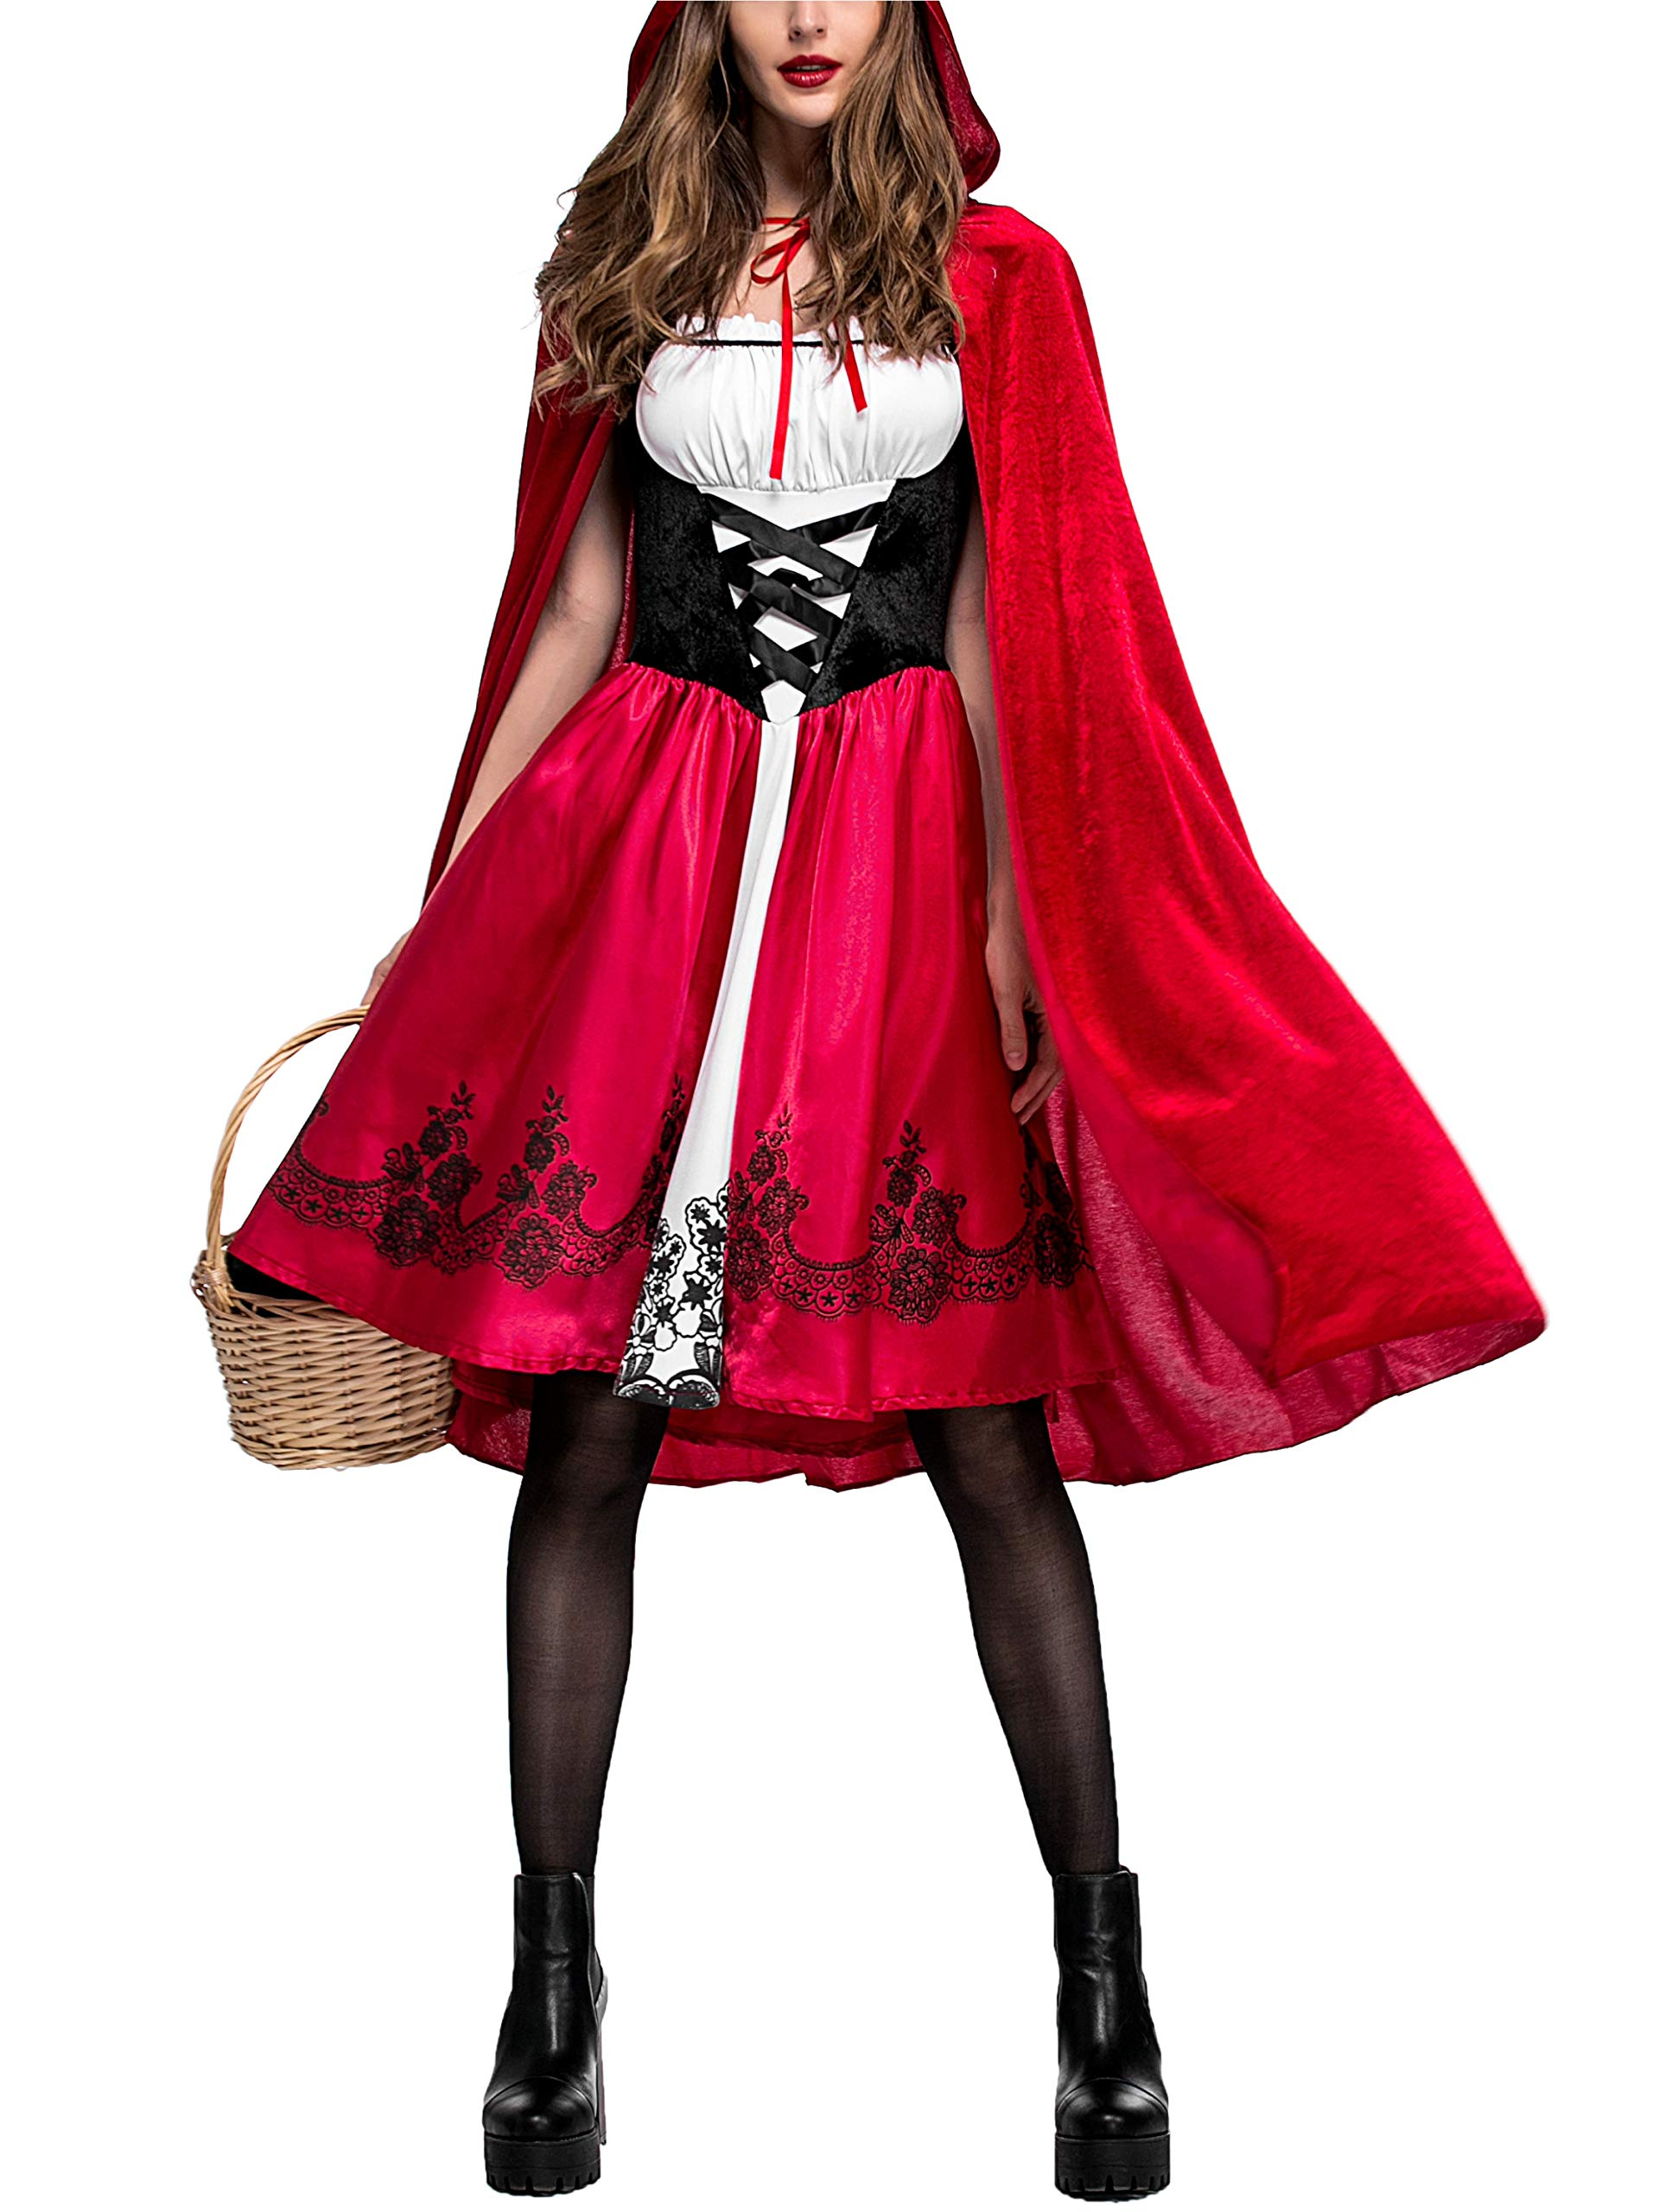 Rotkäppchen Damen Kostüm Karneval Fasching Kleid Kapuzenumhang Verkleidung